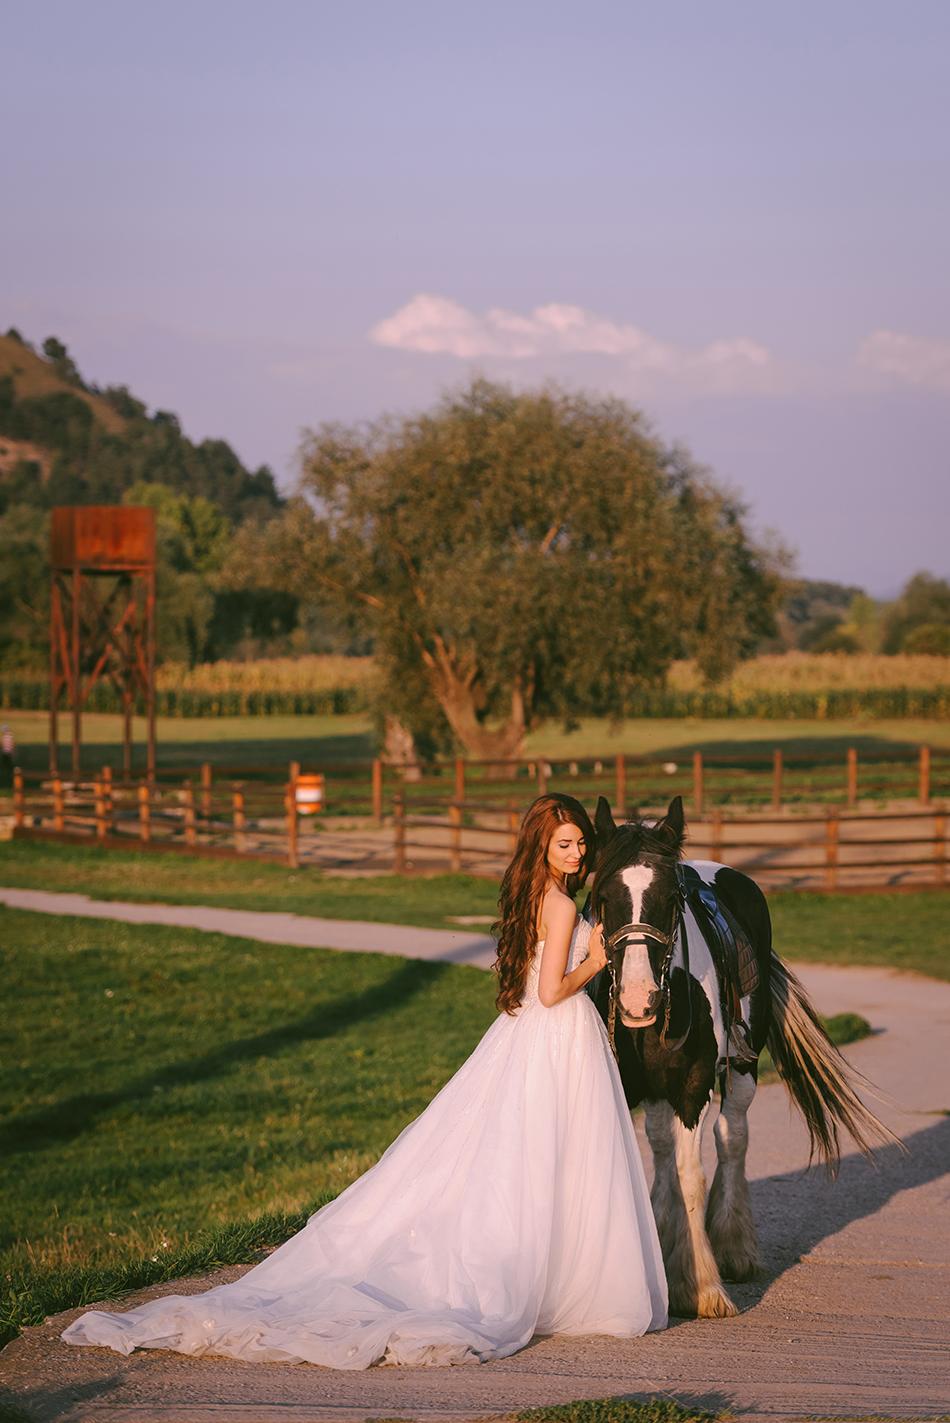 AD Passion Photography | fotograf-nunta-brasov-poiana-brasov-fotograf-profesionist_lorena-cristi_ttd_0073 | Adelin, Dida, fotograf profesionist, fotograf de nunta, fotografie de nunta, fotograf Timisoara, fotograf Craiova, fotograf Bucuresti, fotograf Arad, nunta Timisoara, nunta Arad, nunta Bucuresti, nunta Craiova